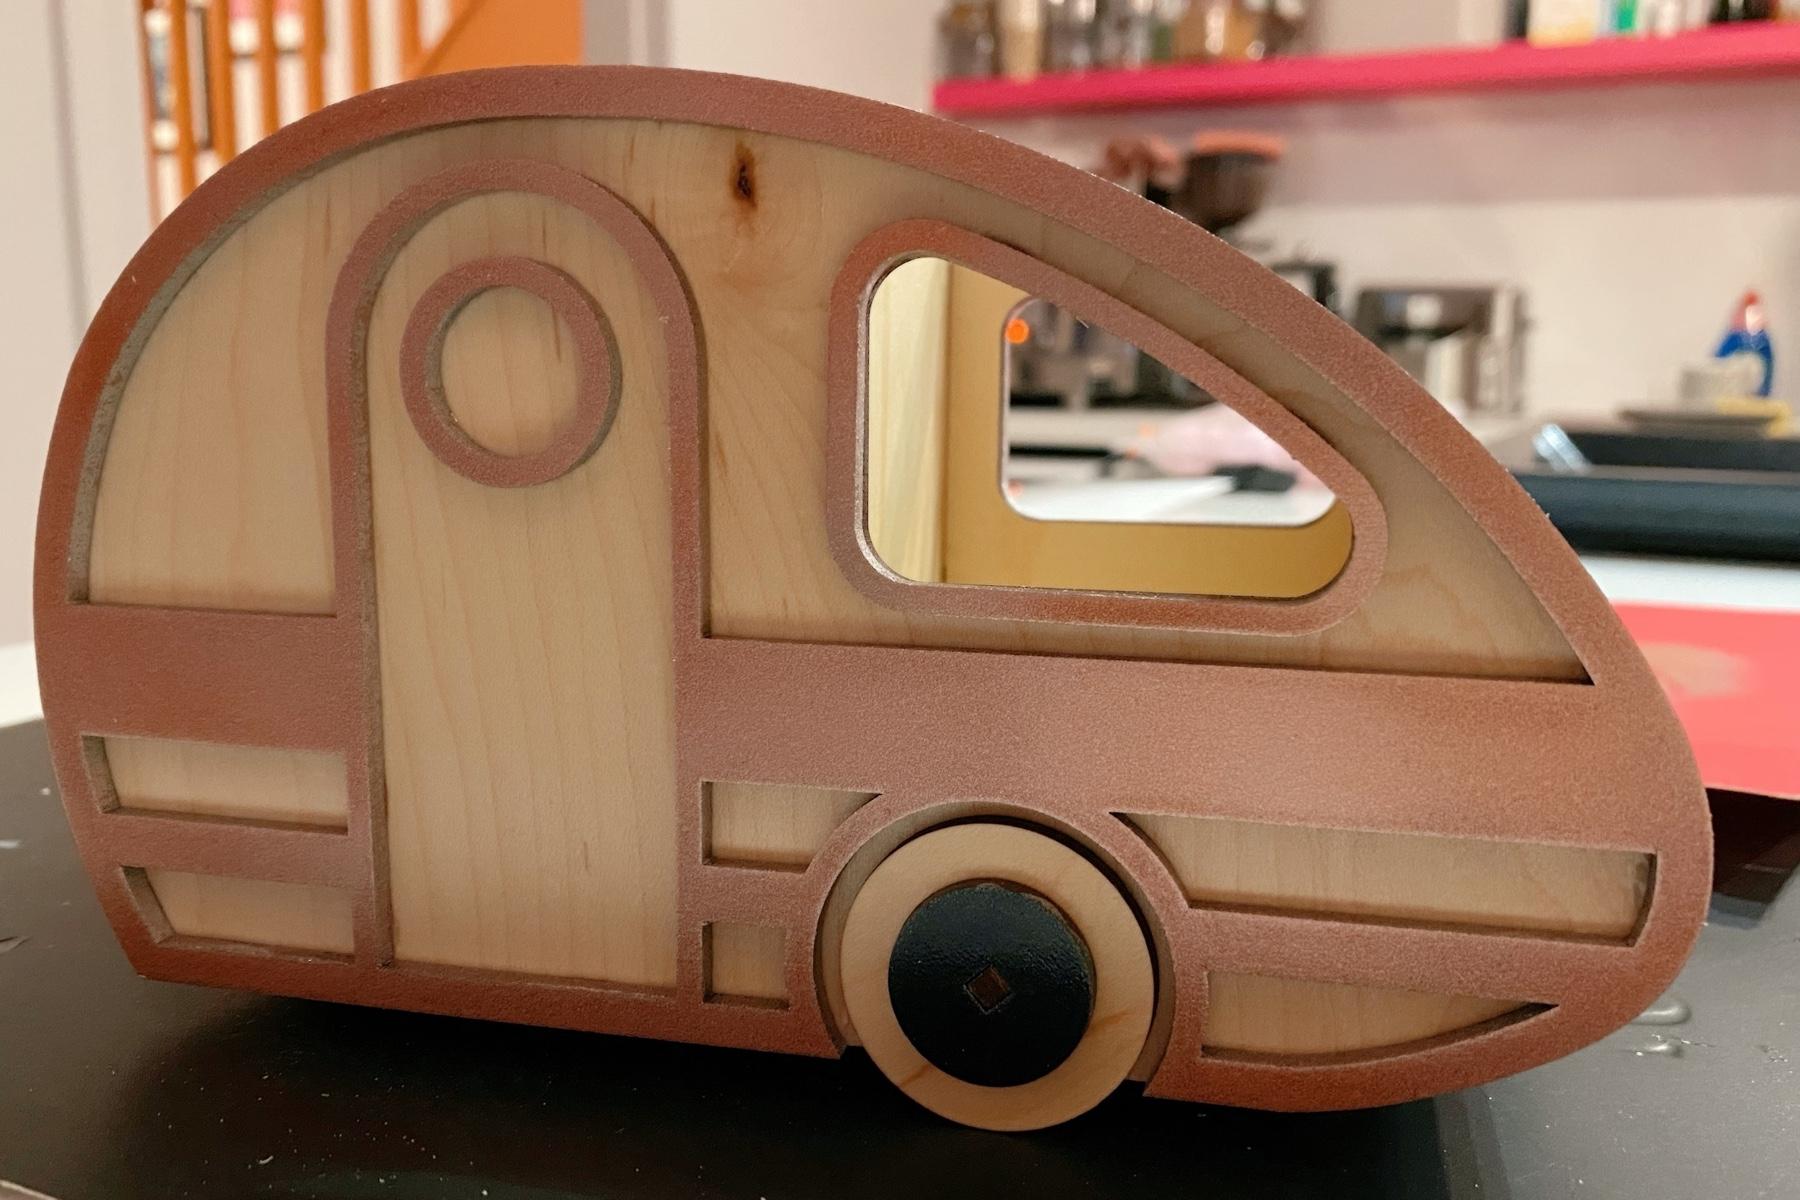 Retro camper van in rose gold